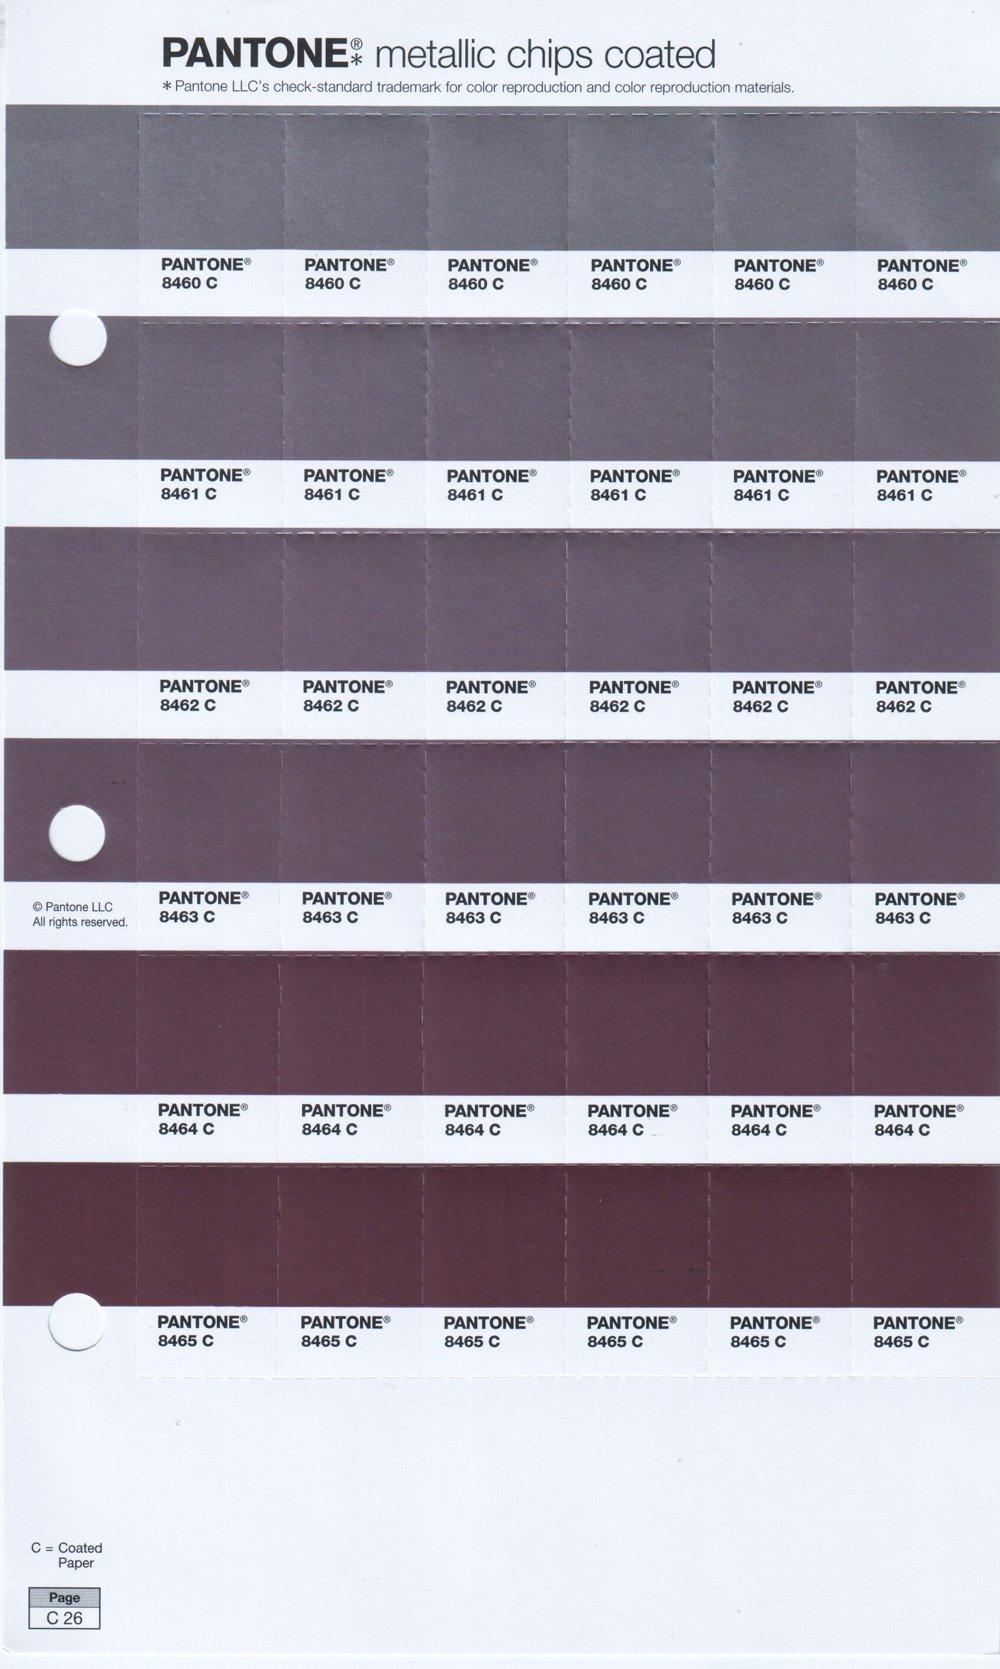 Pantone Metallics Page 23 by Pantone (Image #1)